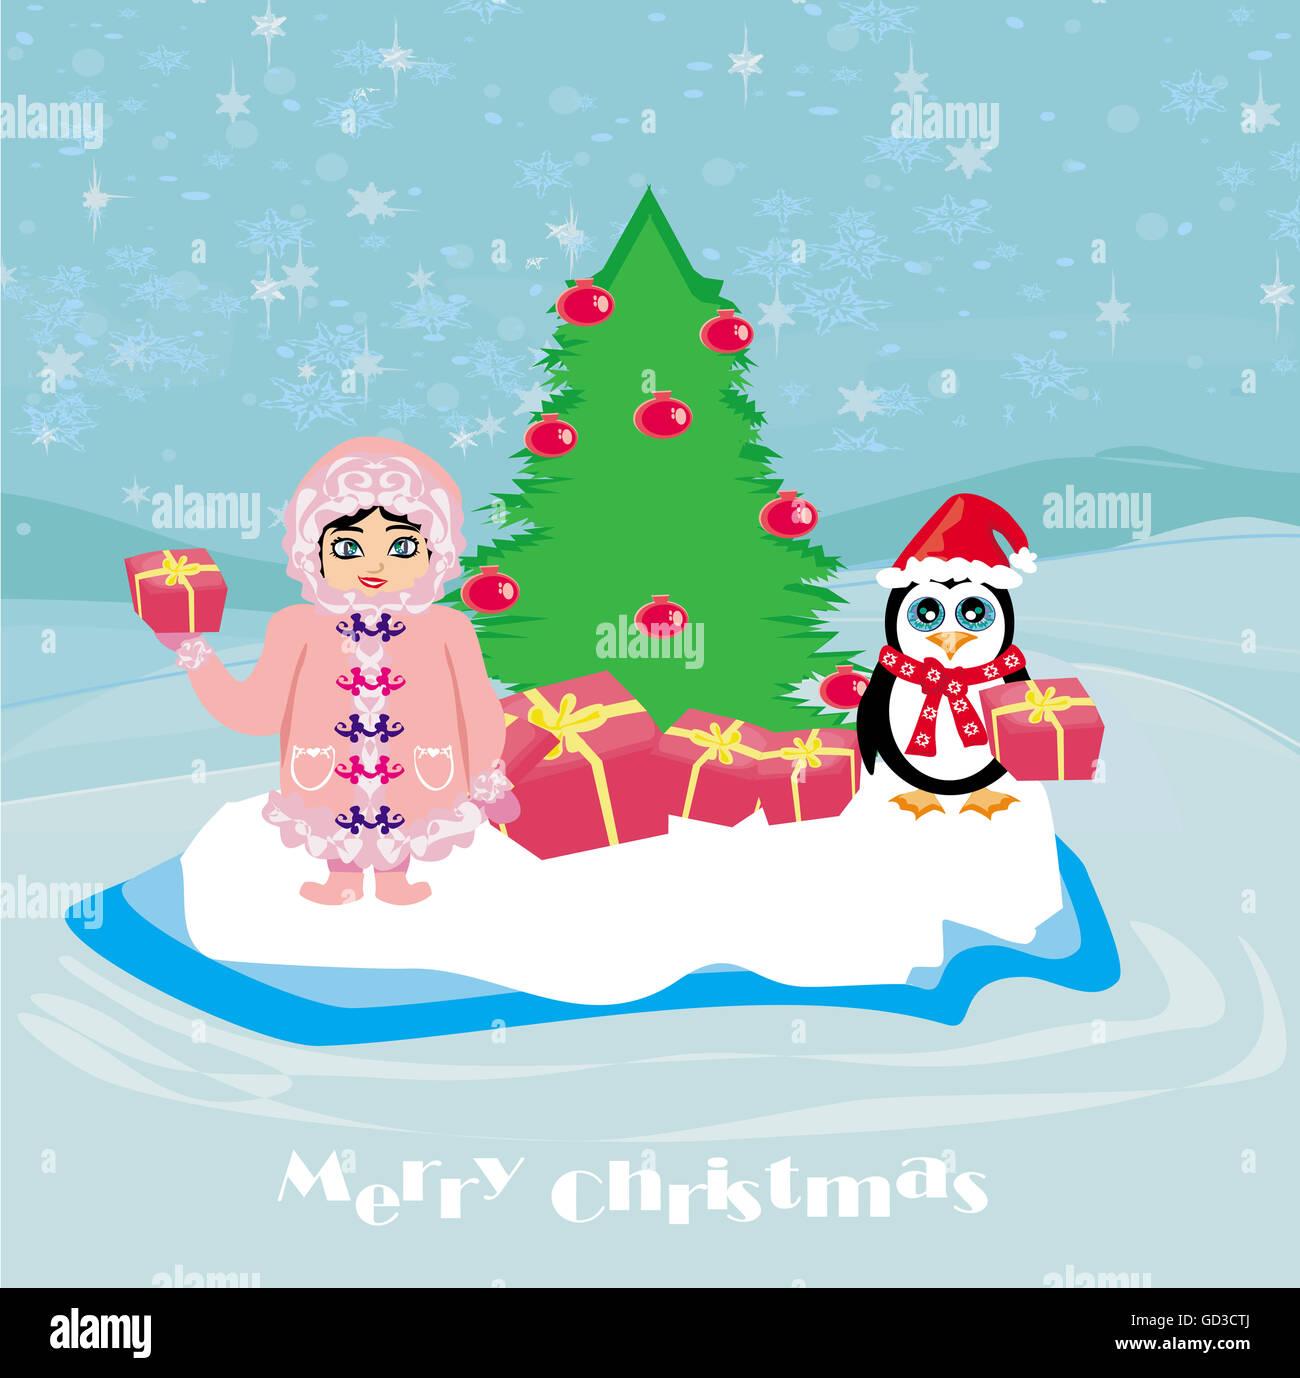 Funny Christmas Card Penguin Small Stock Photos Funny Christmas